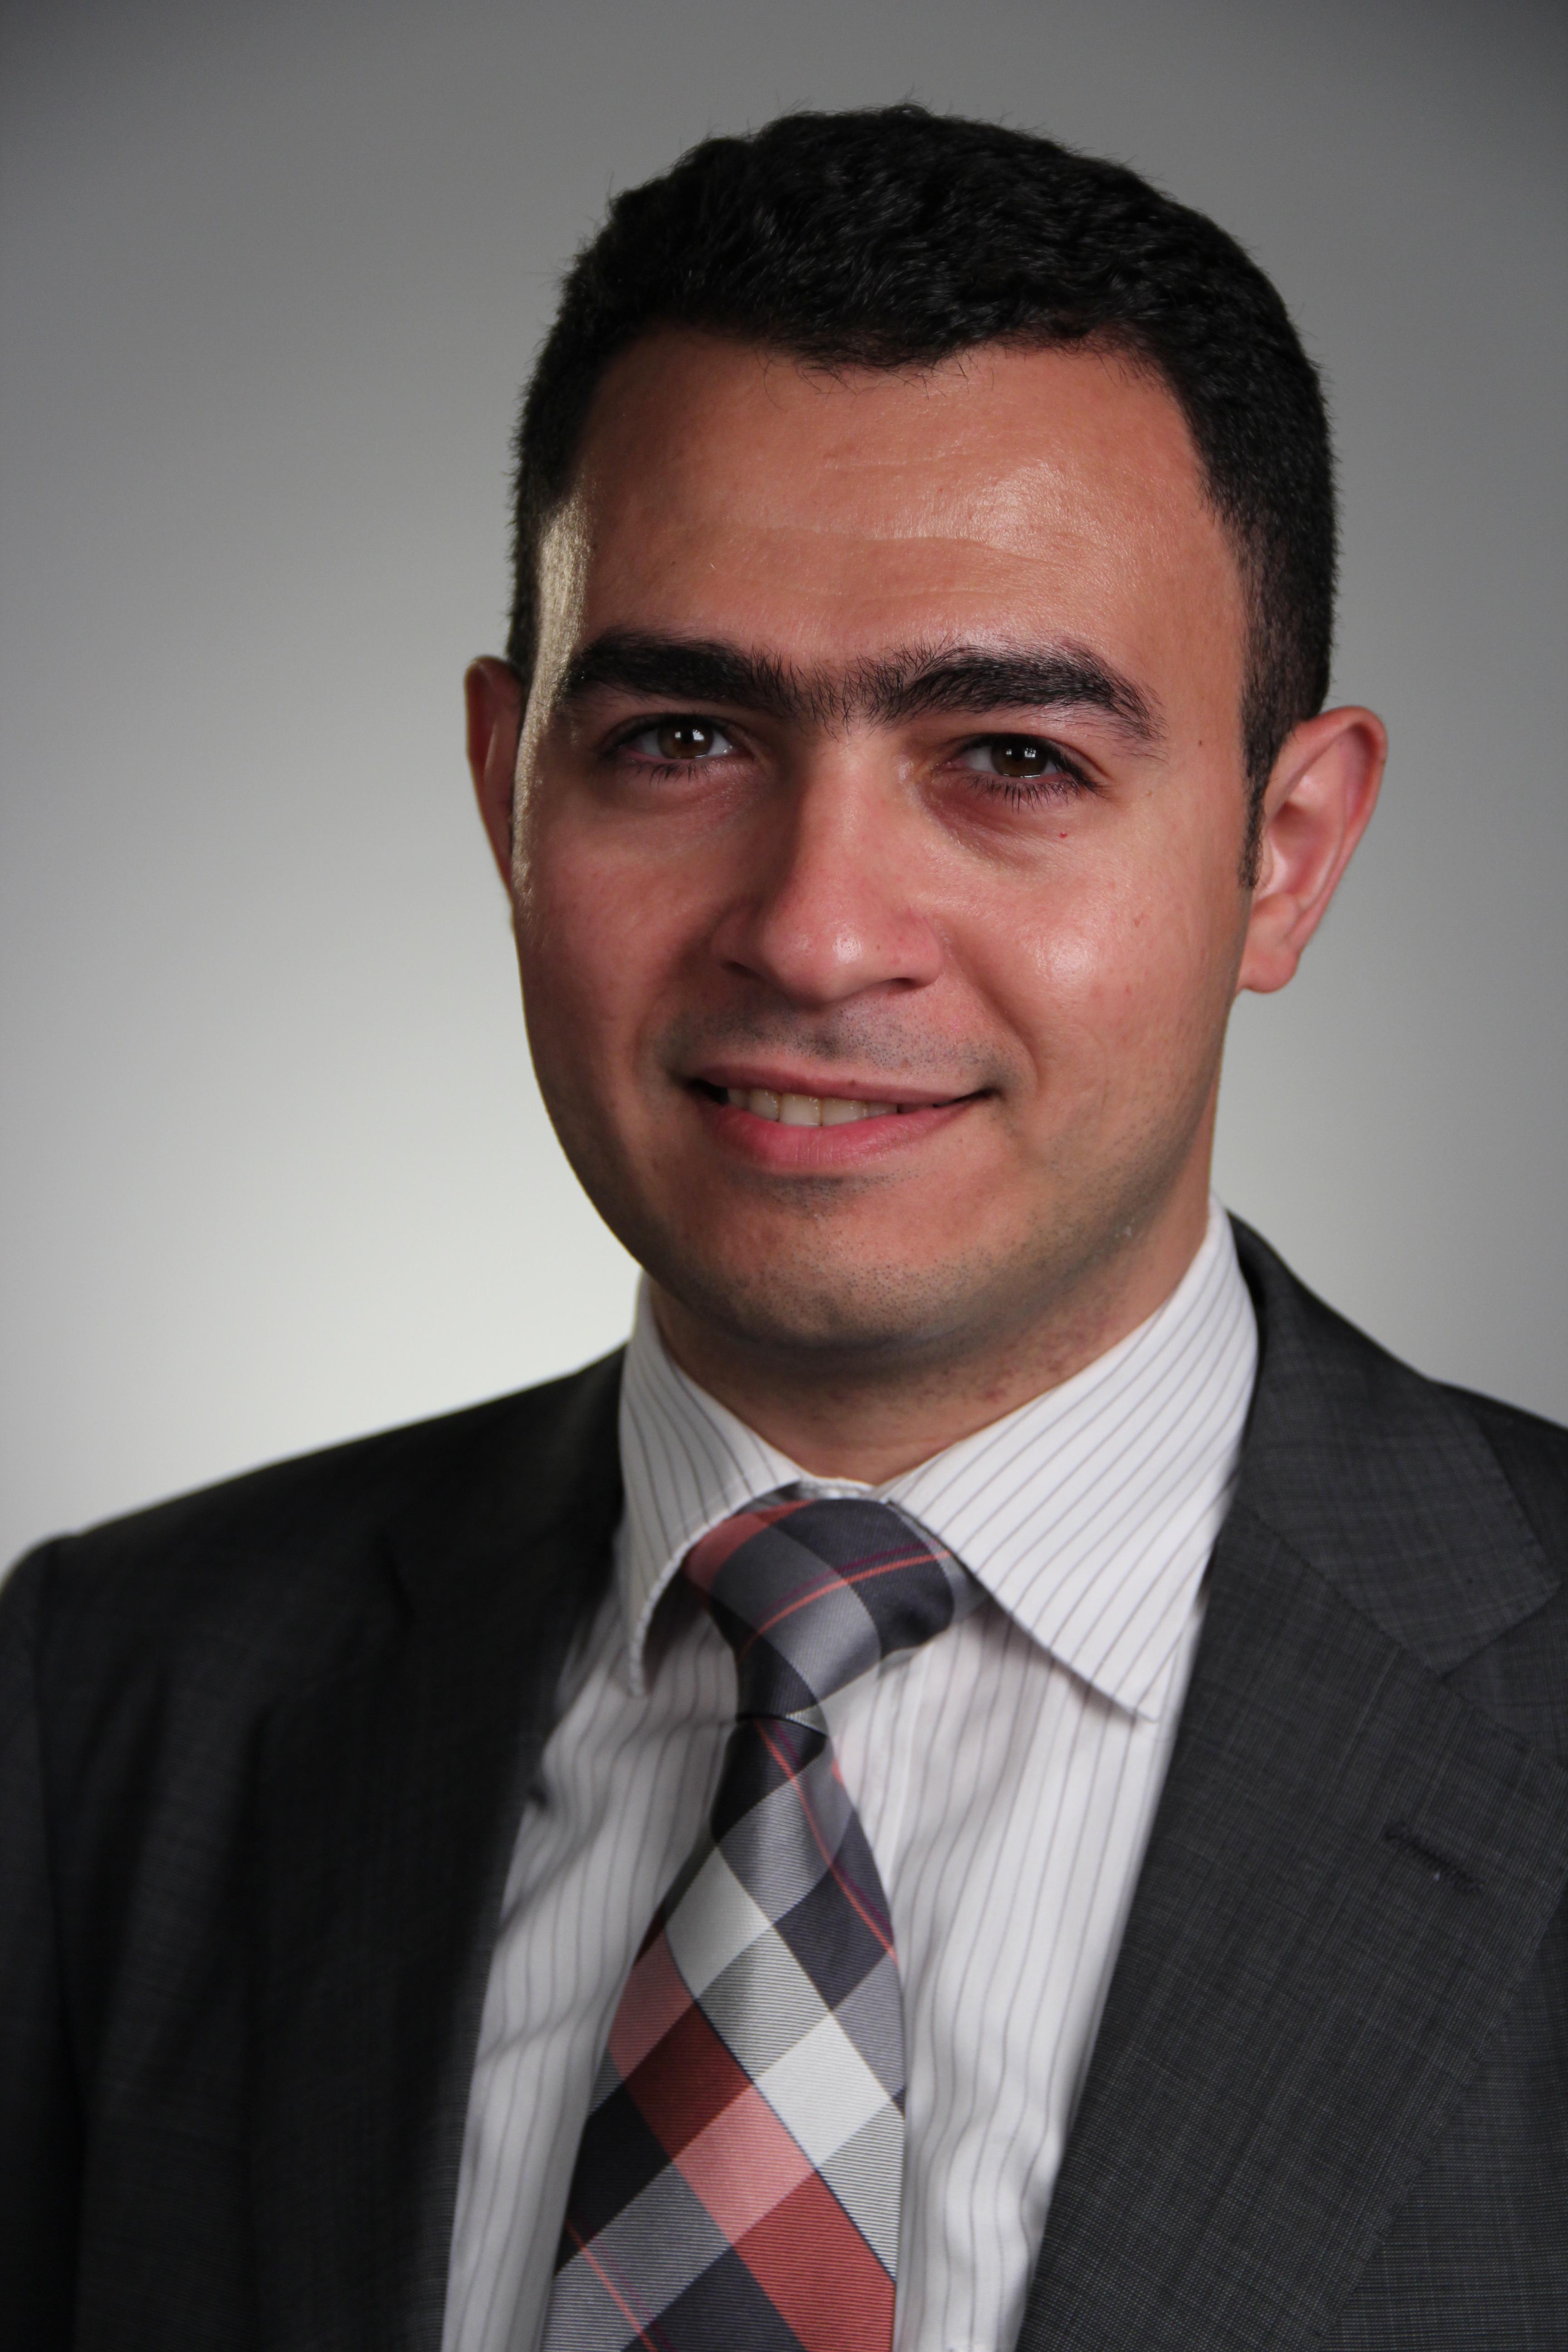 Abdulla M. Erfan